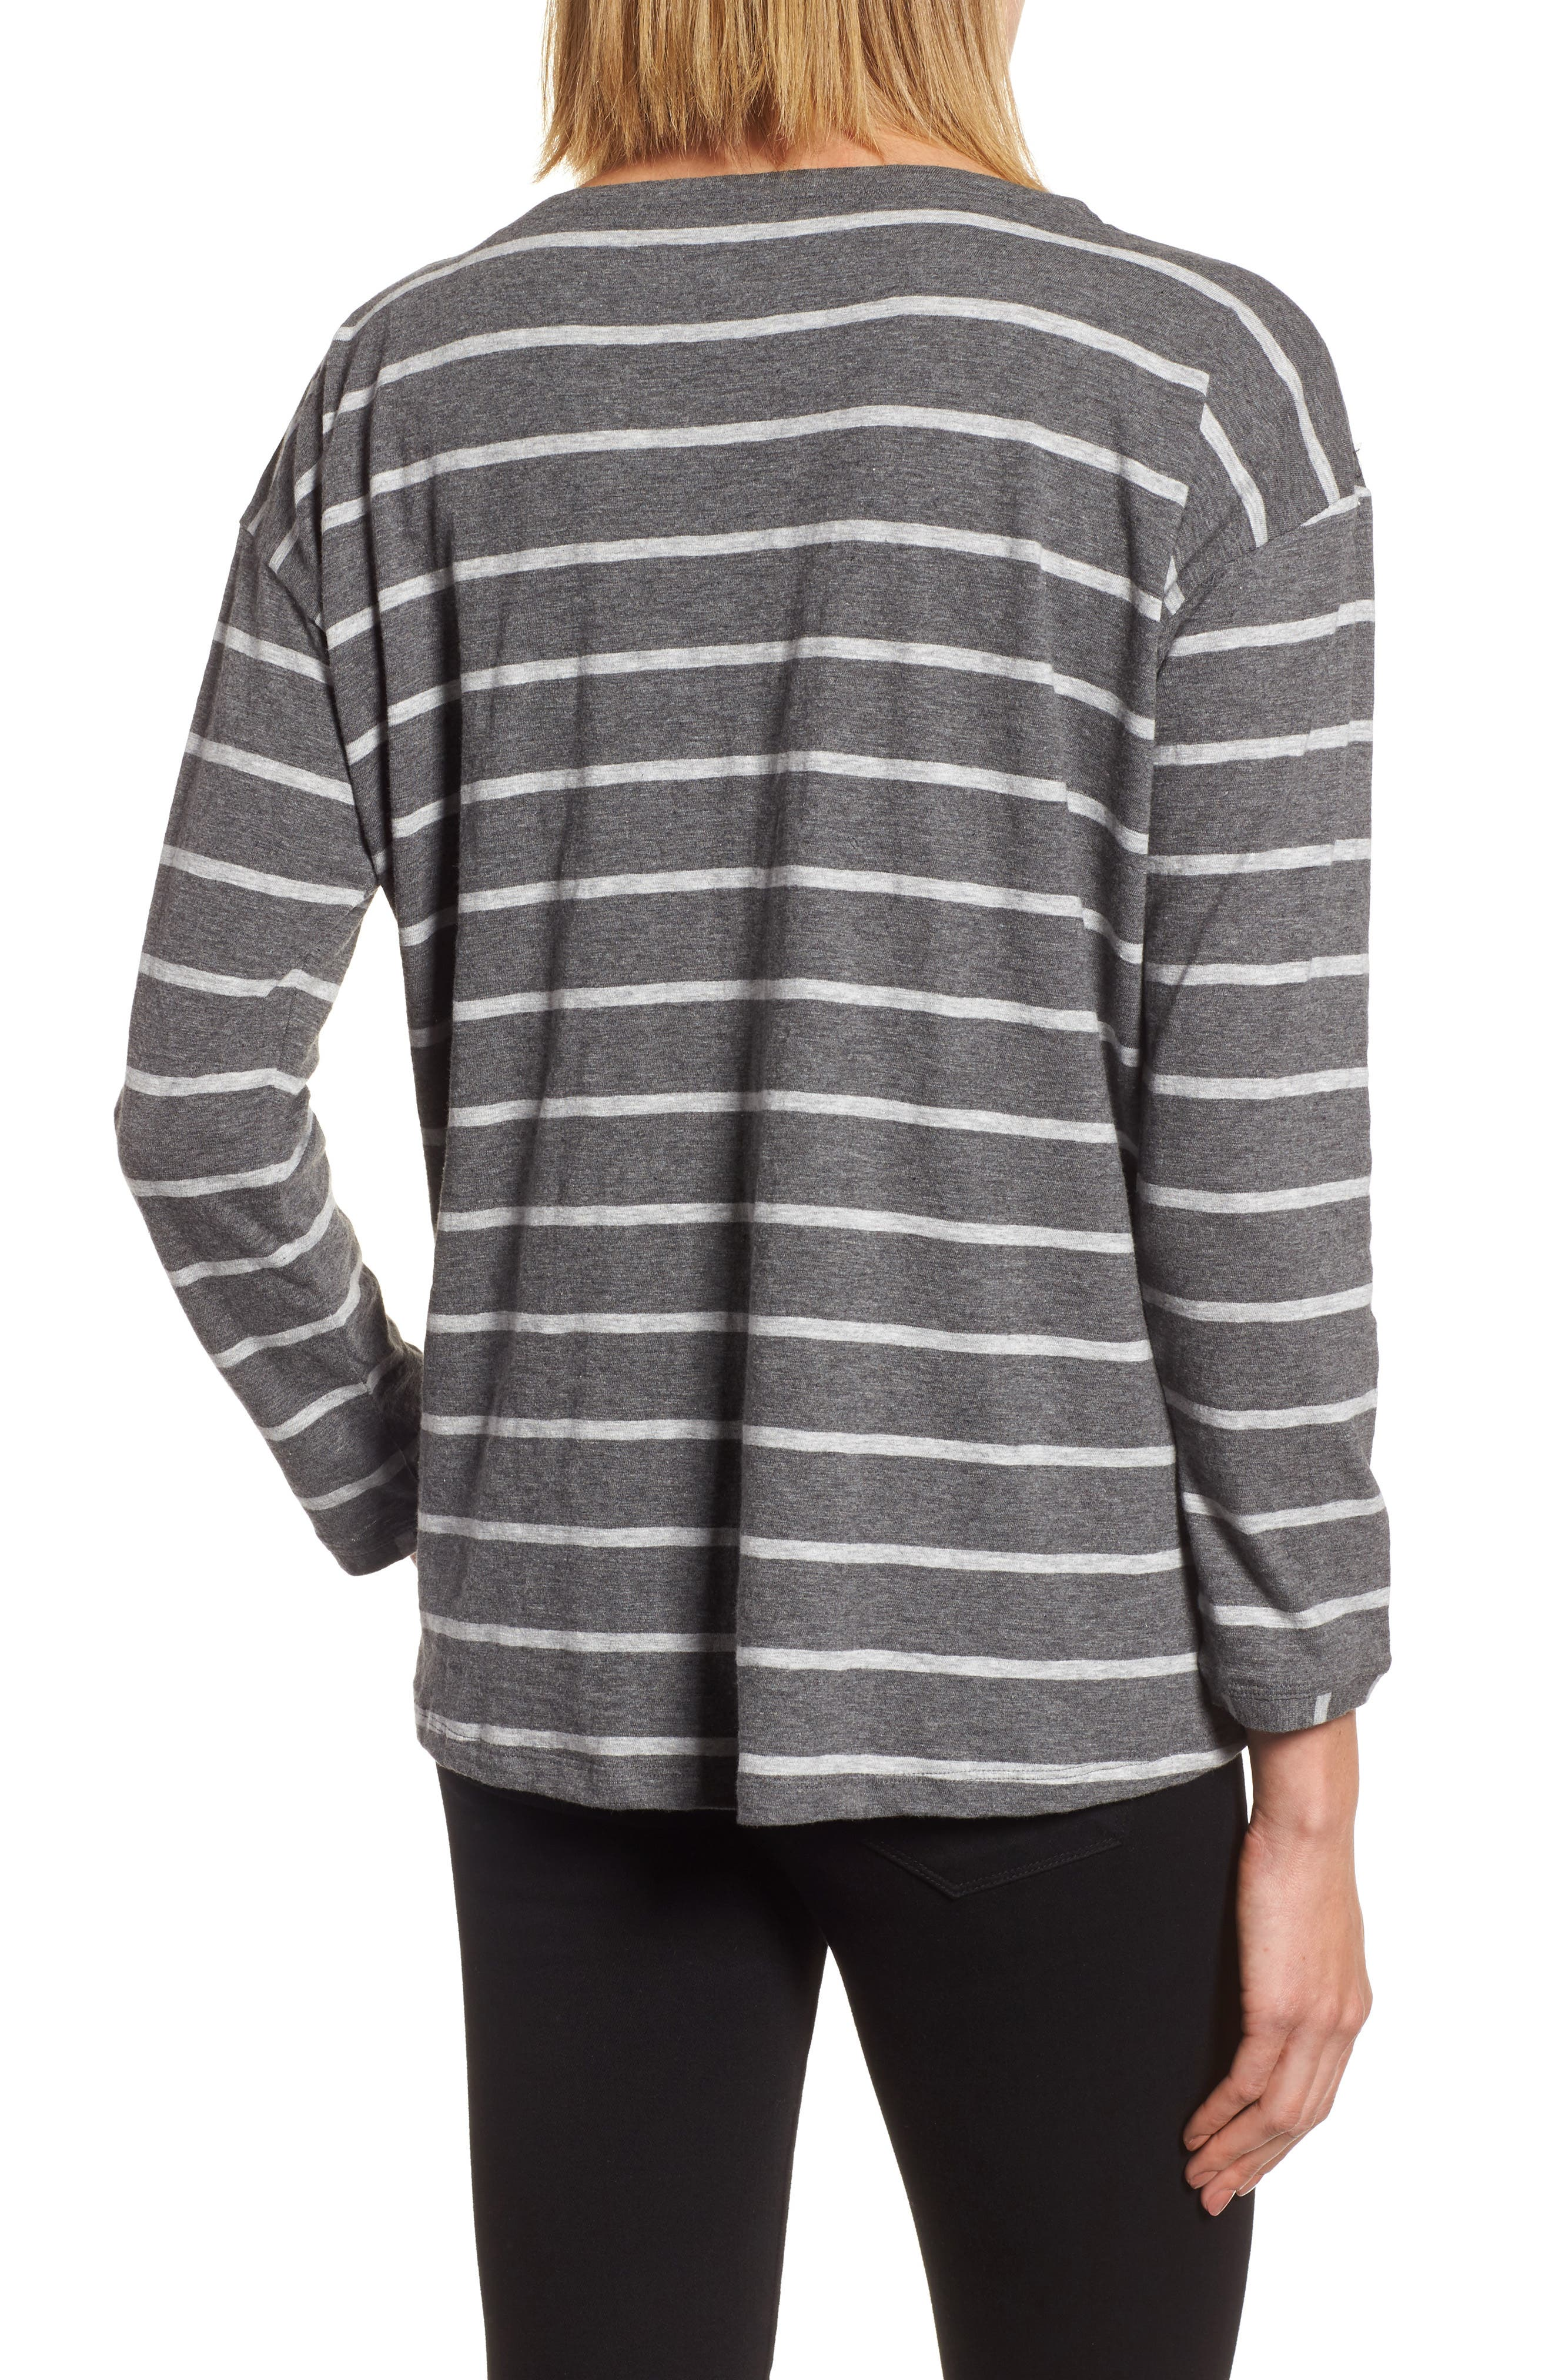 Stripe Organic Cotton Top,                             Alternate thumbnail 2, color,                             030